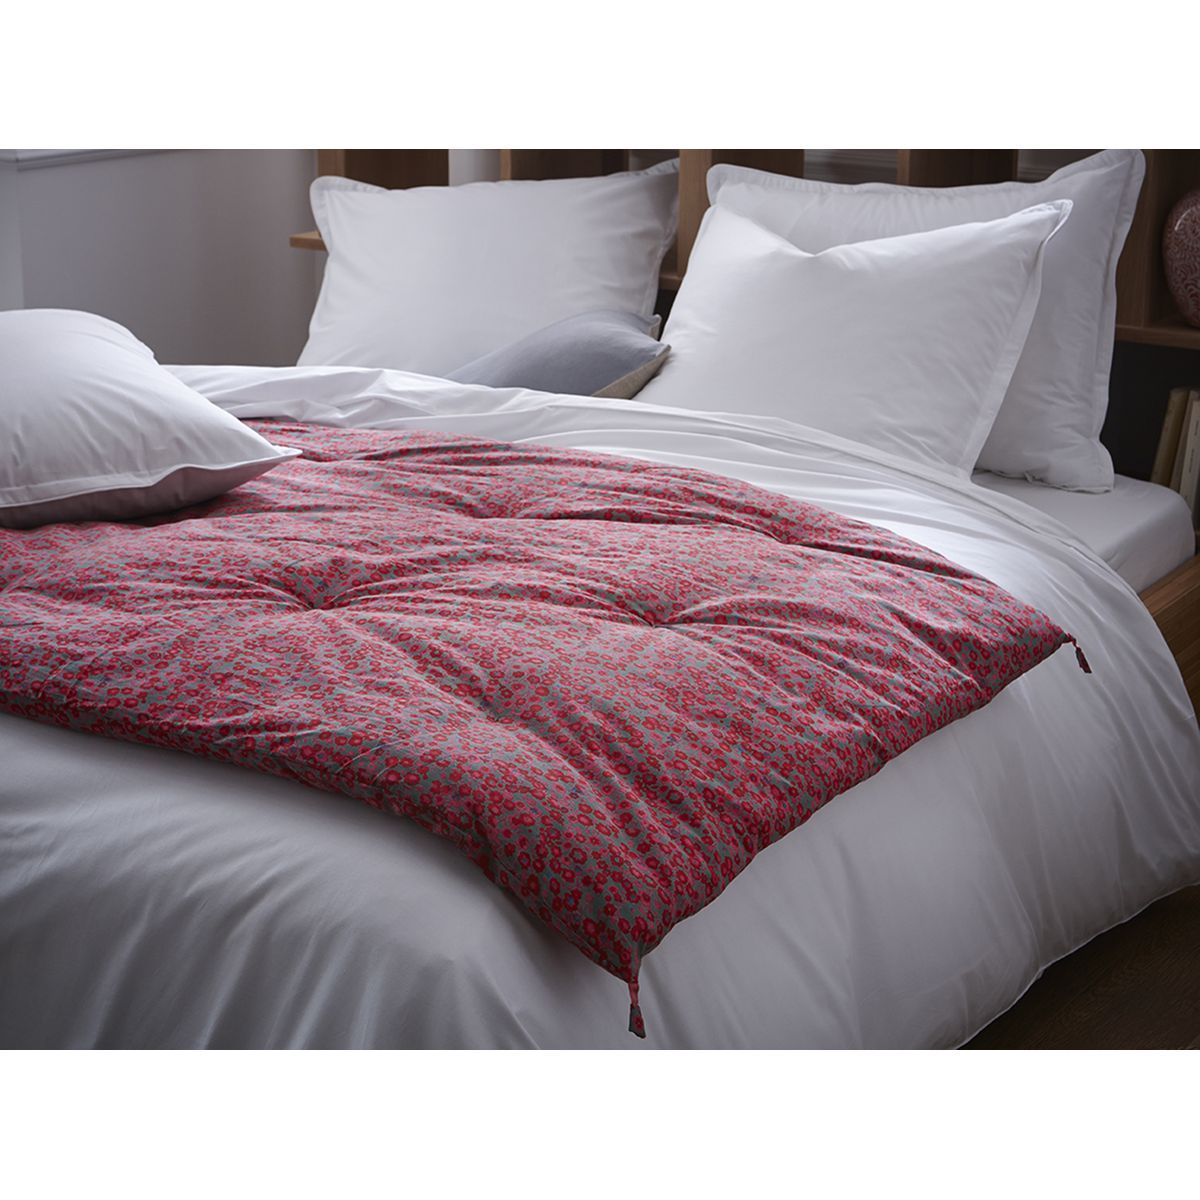 edredon matelass imprim liberty framboise 100 coton. Black Bedroom Furniture Sets. Home Design Ideas